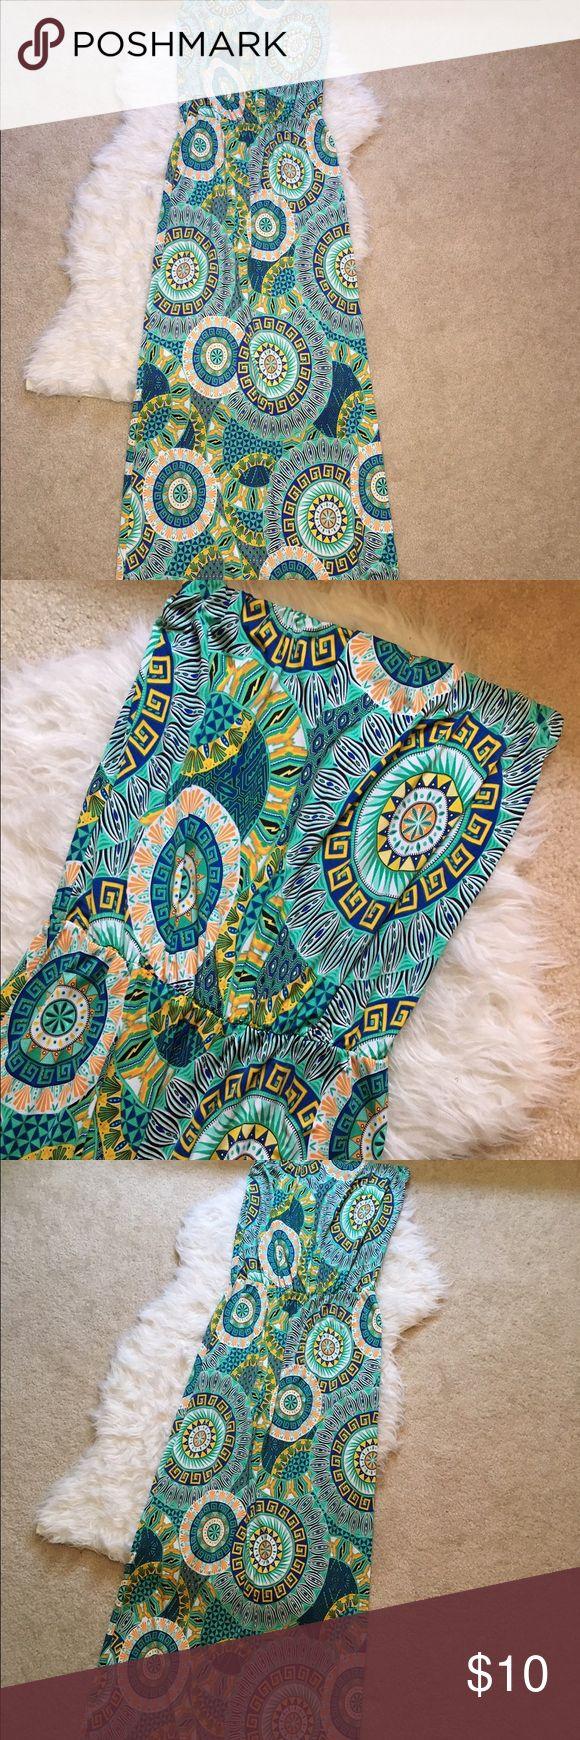 Patterned boho tube top maxi dress Circle patterned boho tube top maxi dress Dresses Maxi